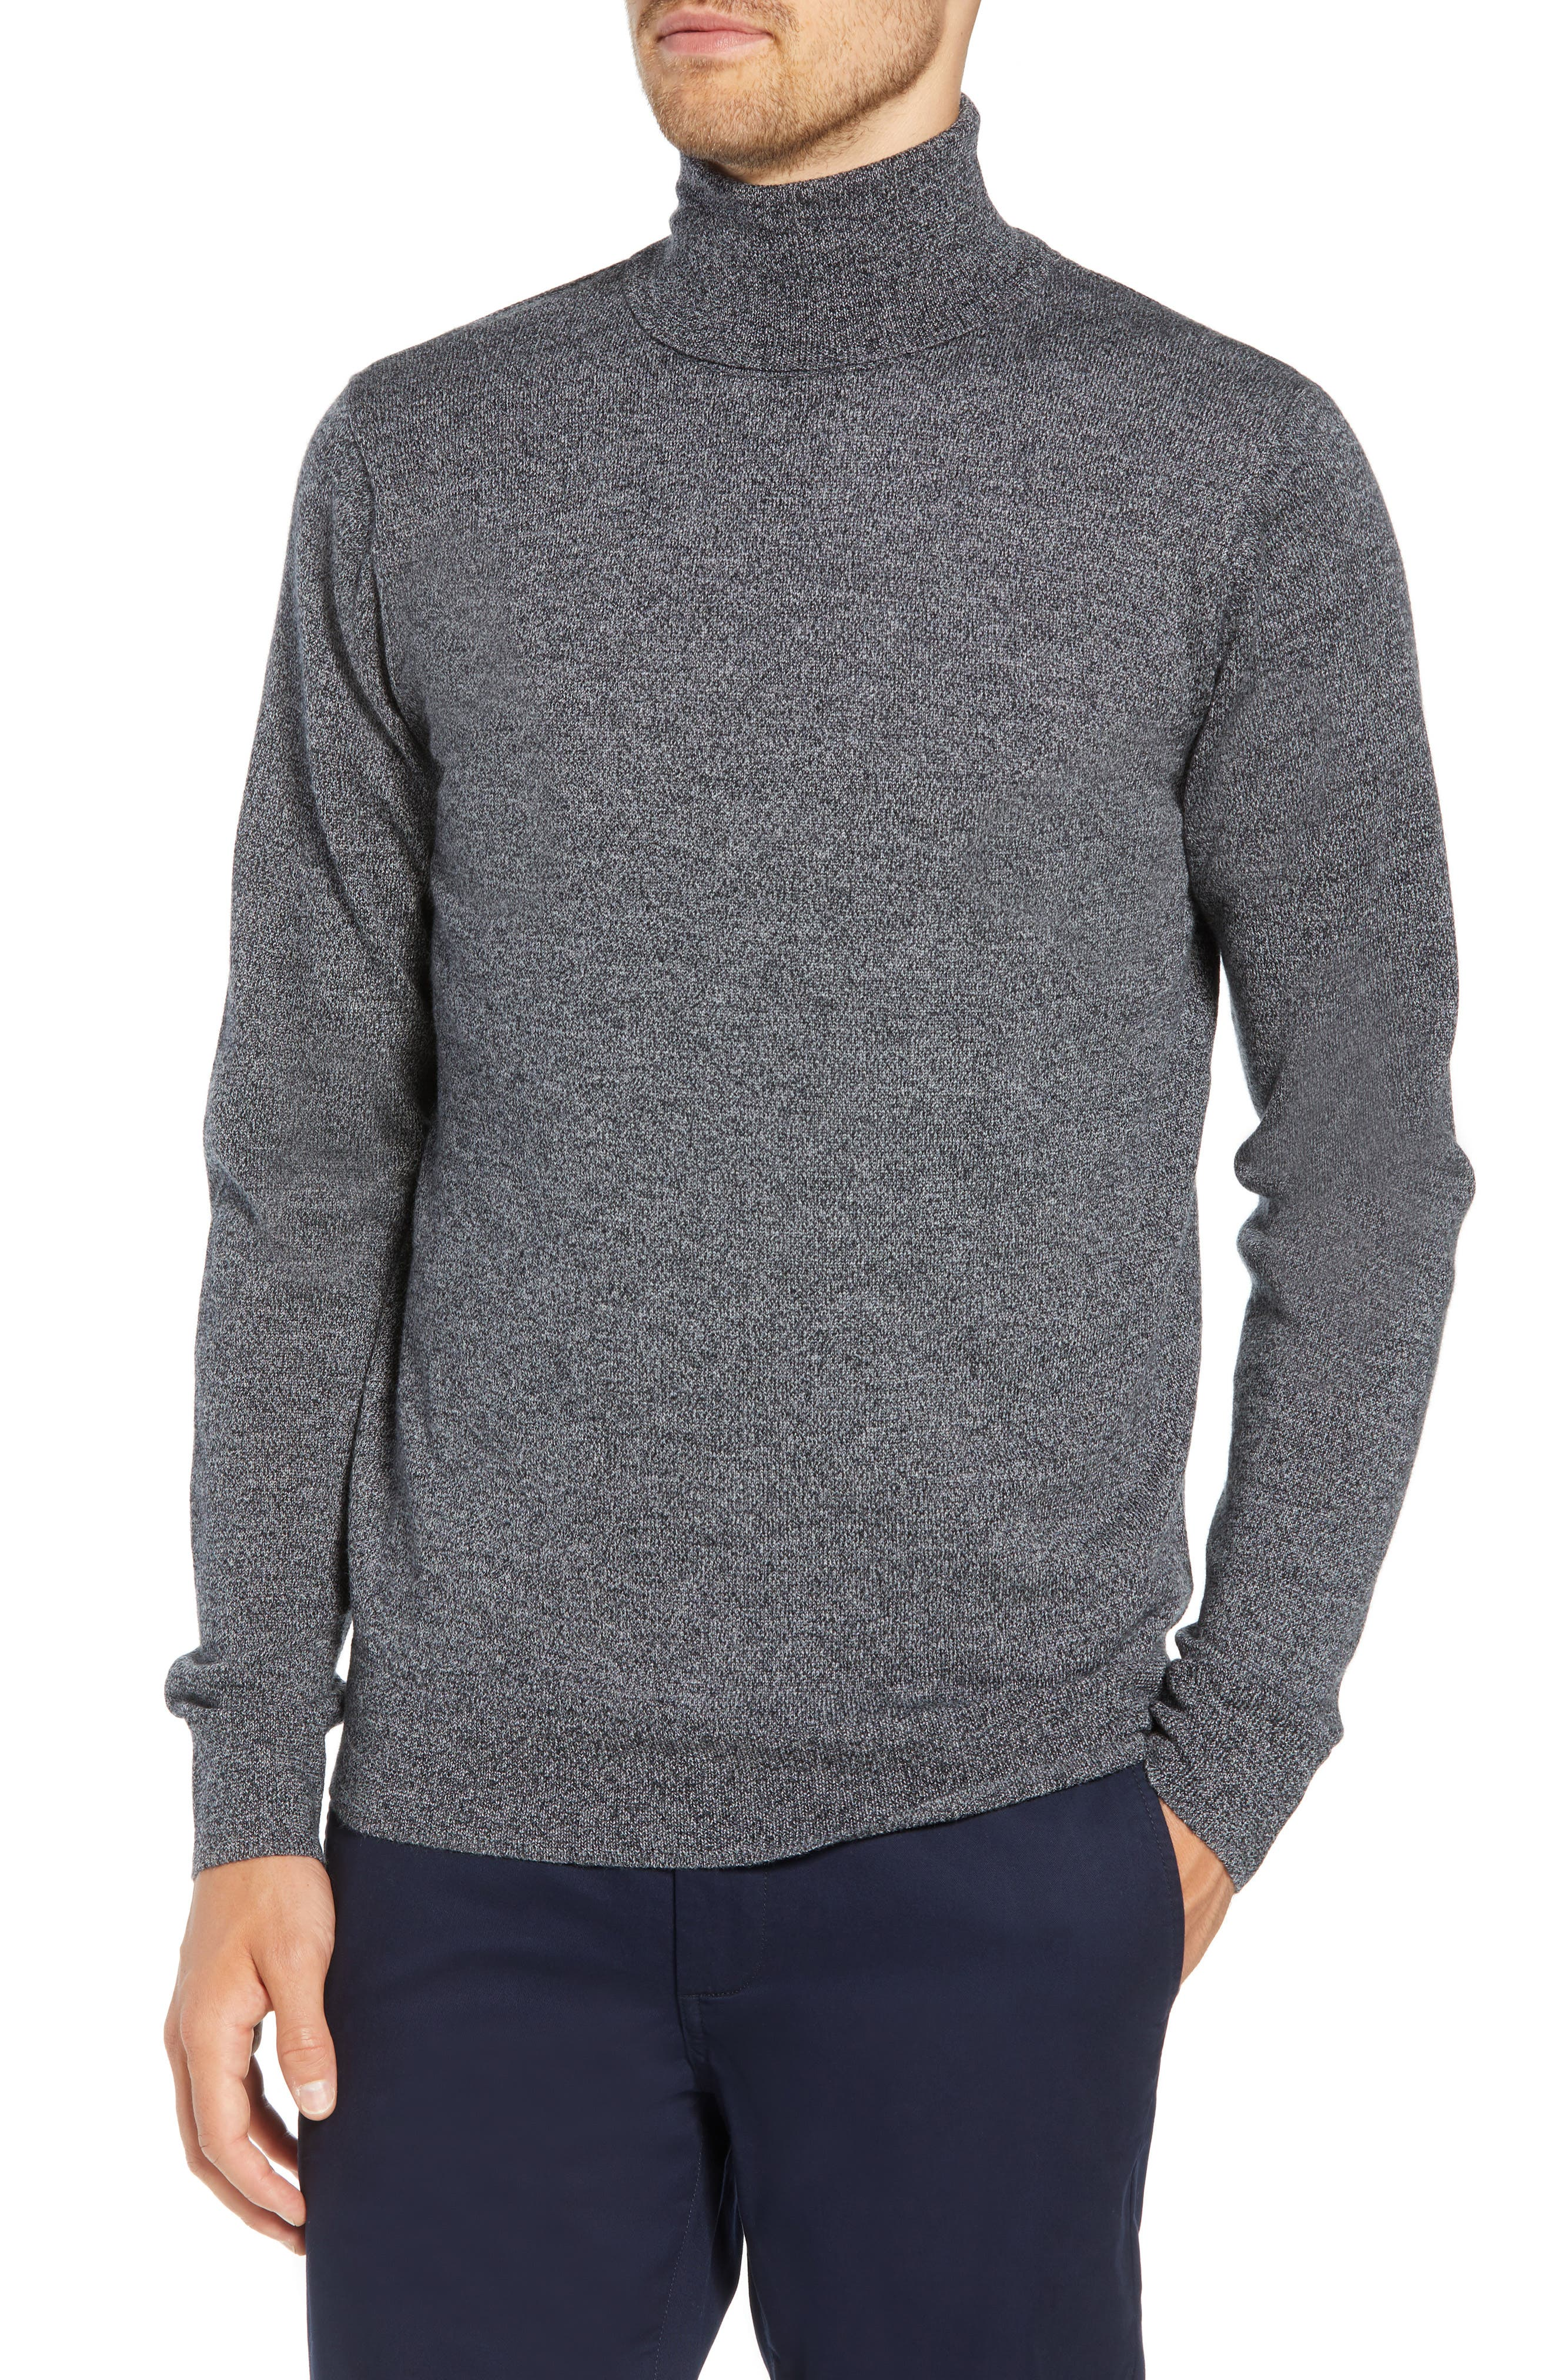 Slim Fit Turtleneck Merino Wool Sweater,                             Main thumbnail 1, color,                             CHARCOAL MARL